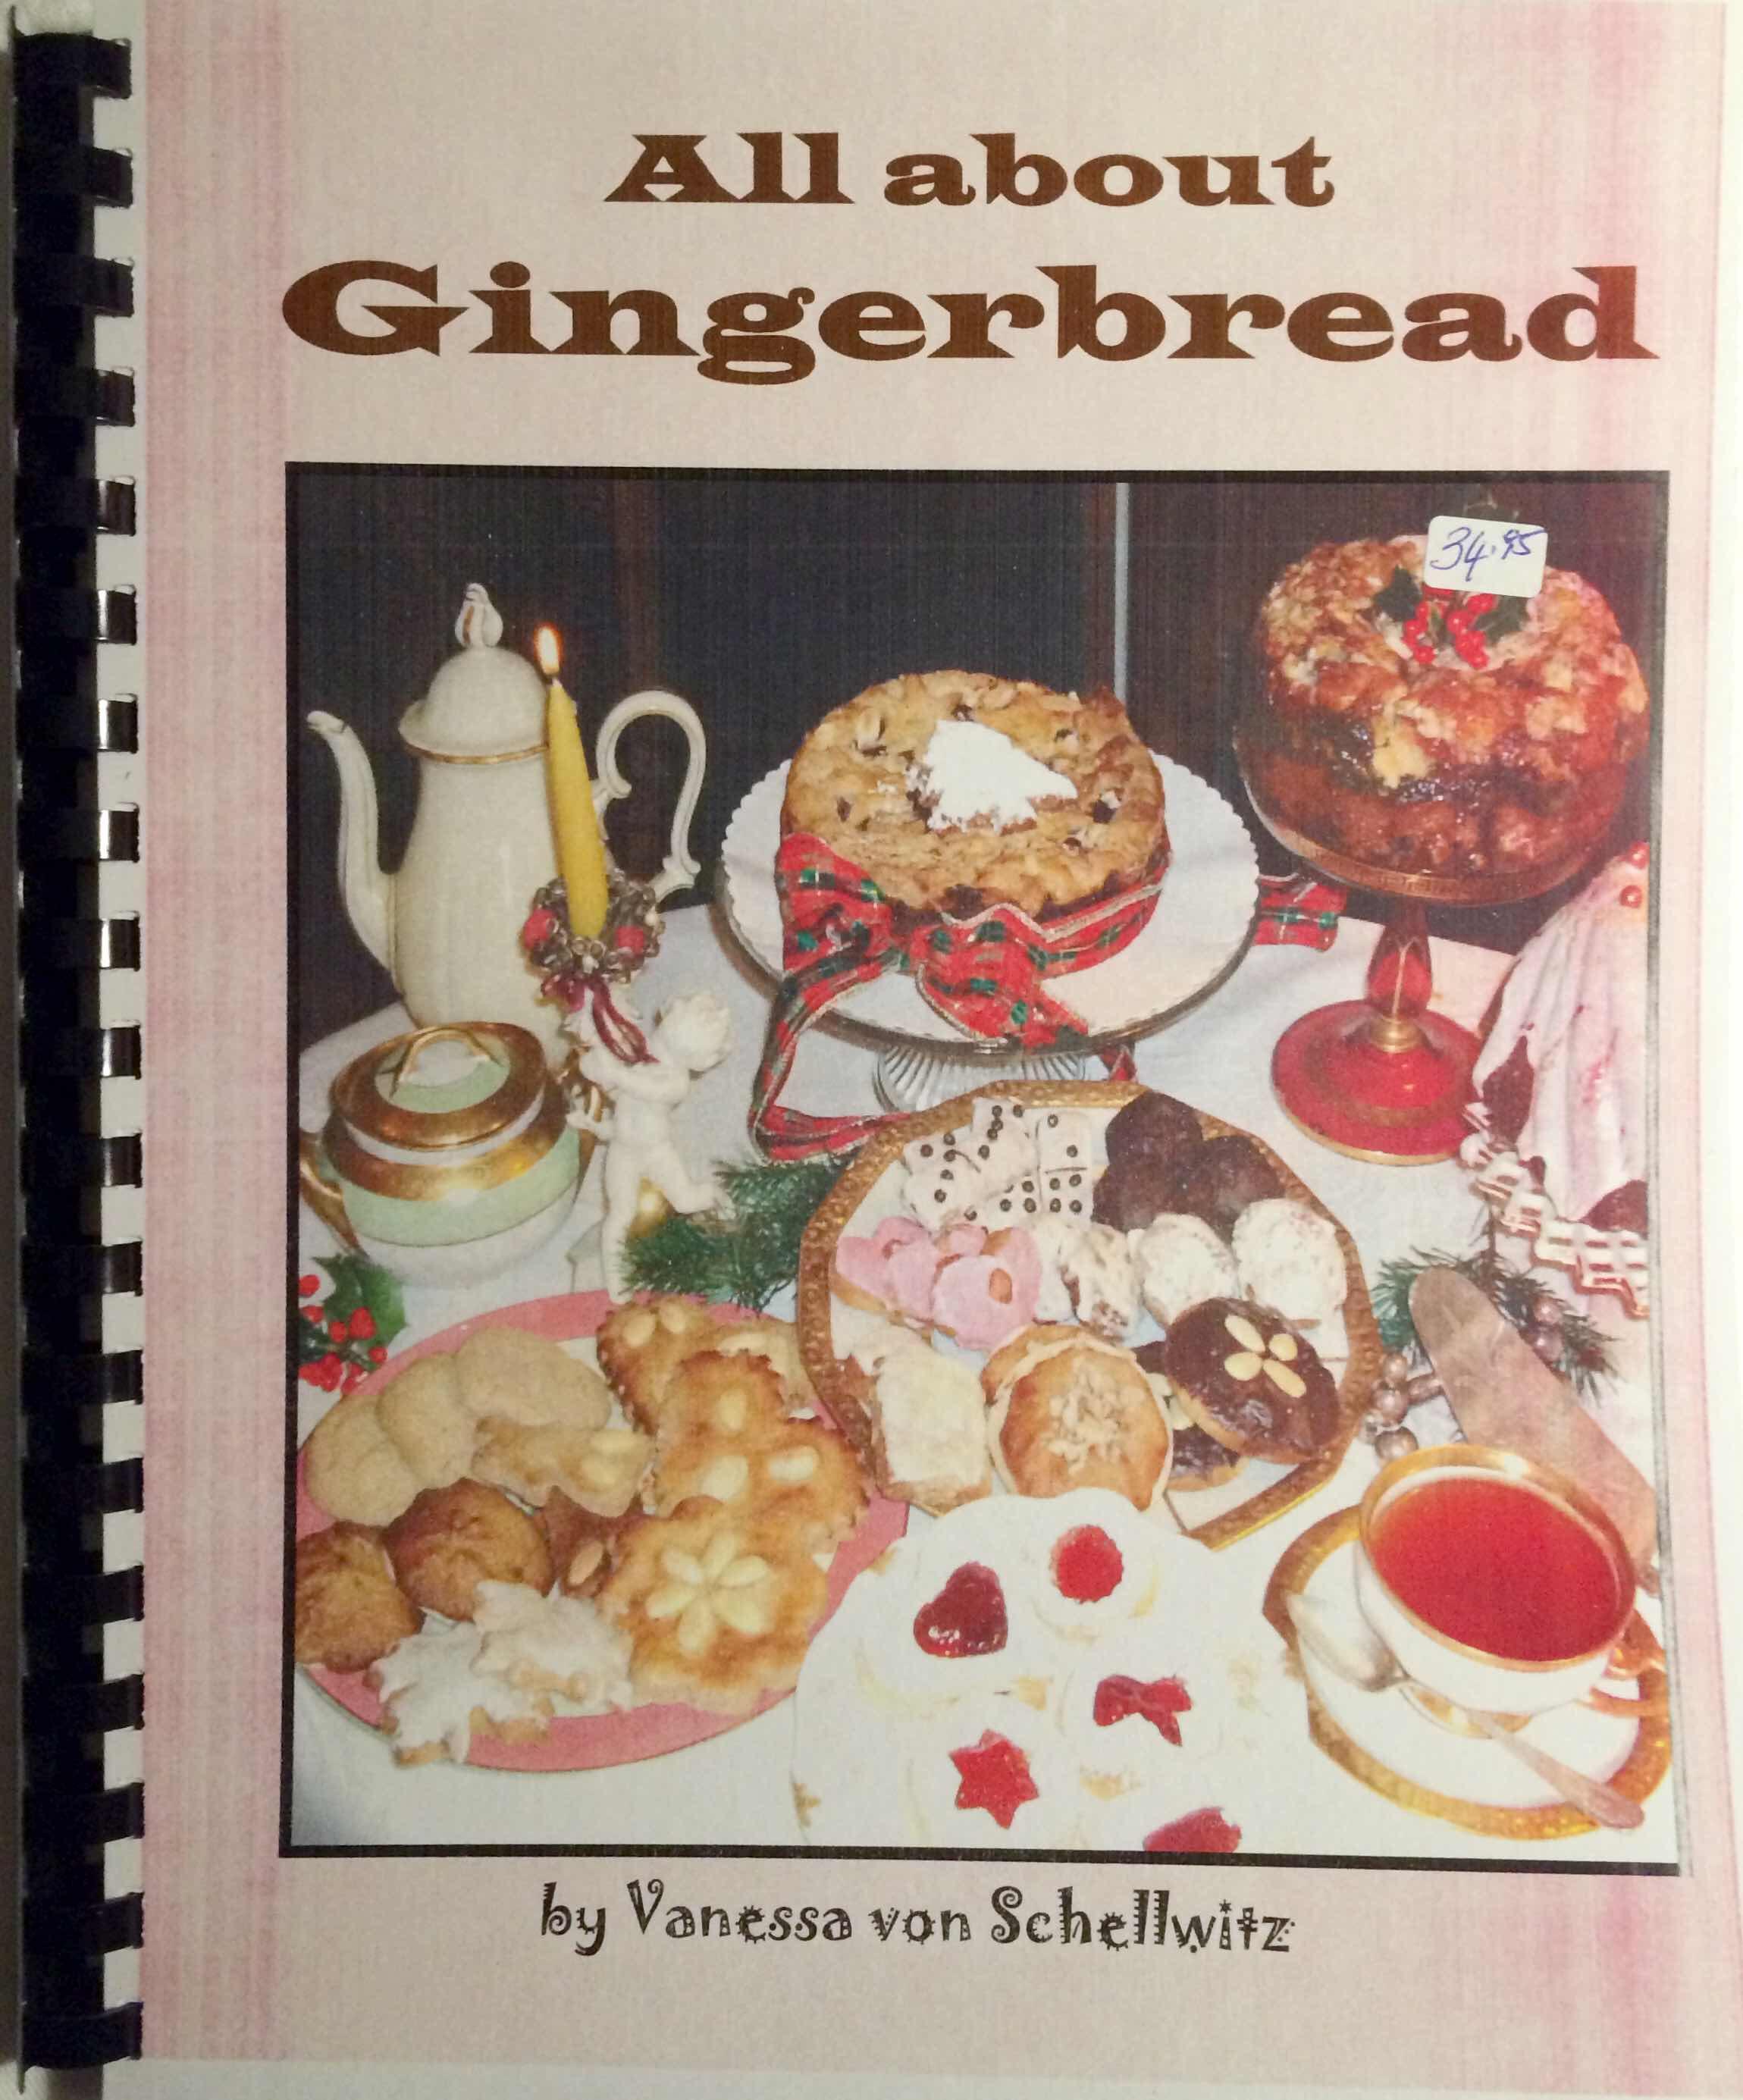 Healthy recipes pdf cookbooks by vanessa von schellwitz gingerbread cookies recipe forumfinder Image collections